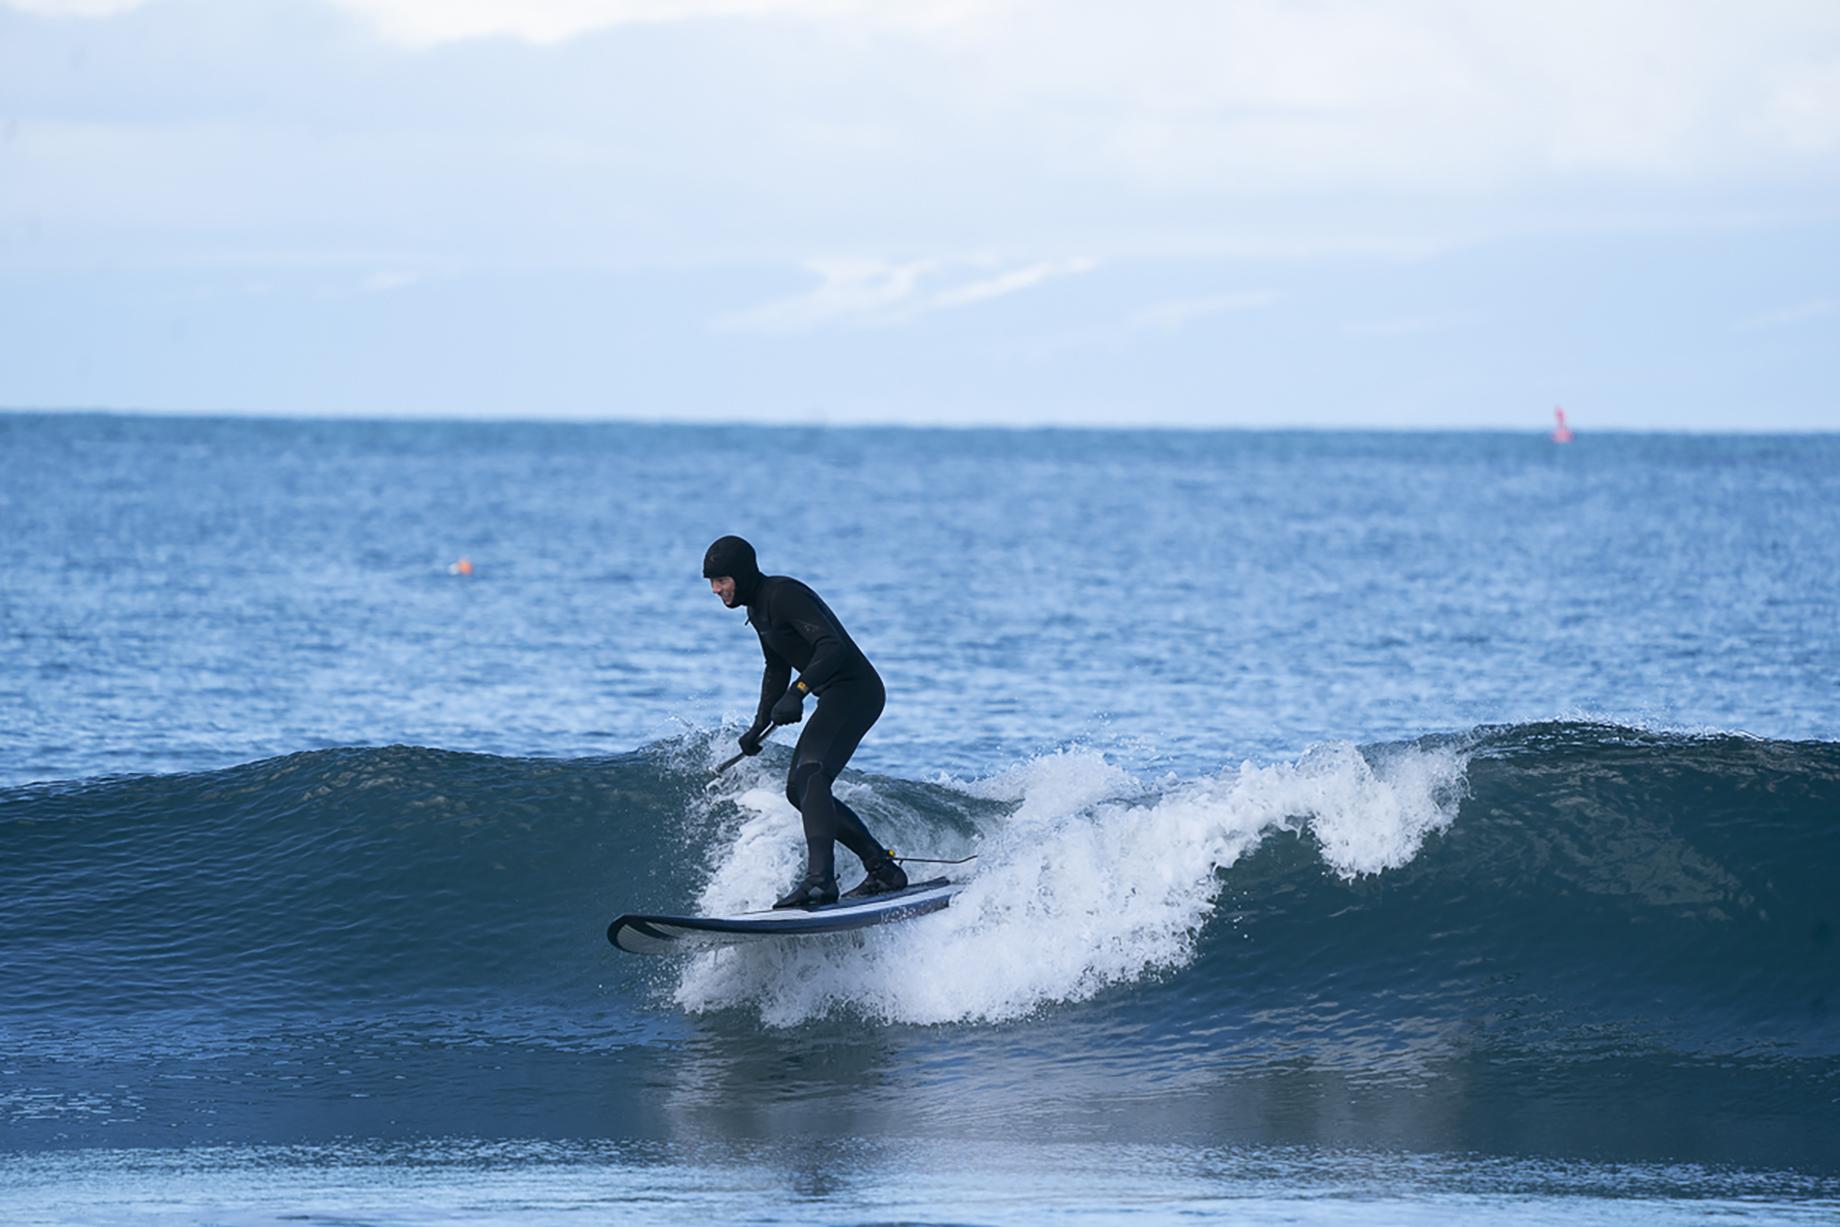 Man in wetsuit surfing on Washington coast shot by Motofish for Hest